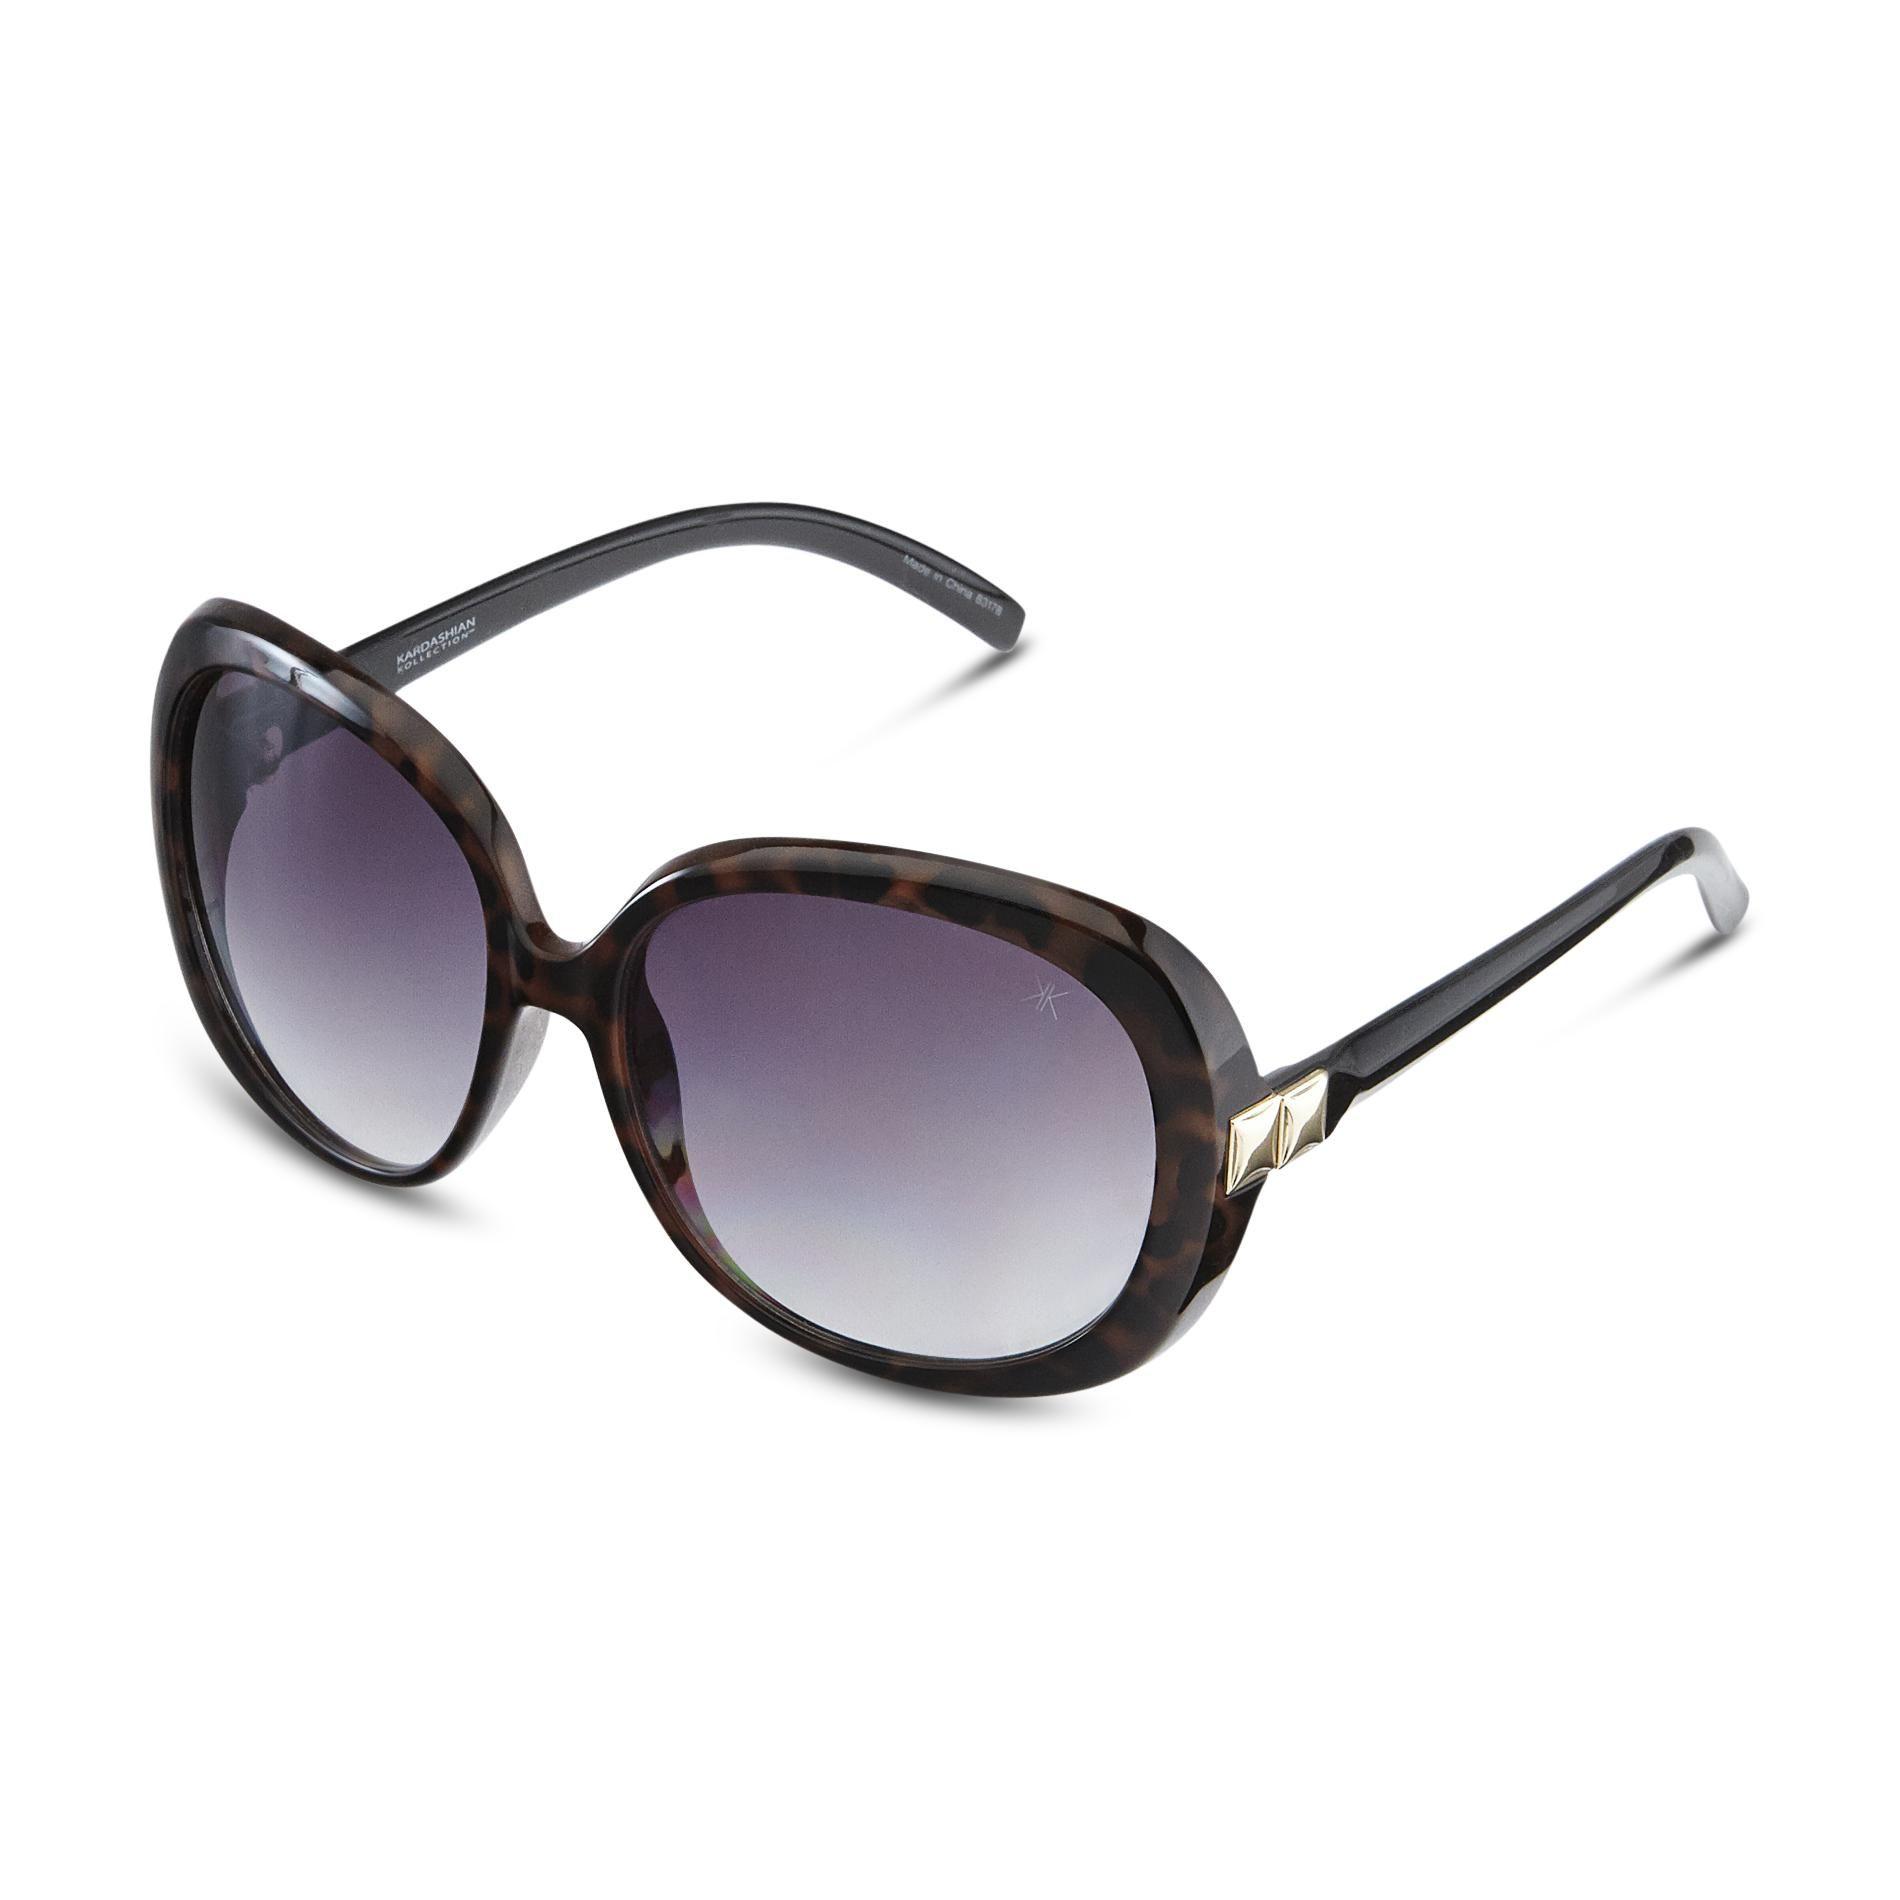 Kardashian Kollection Women's Oversized Vintage Sunglasses -